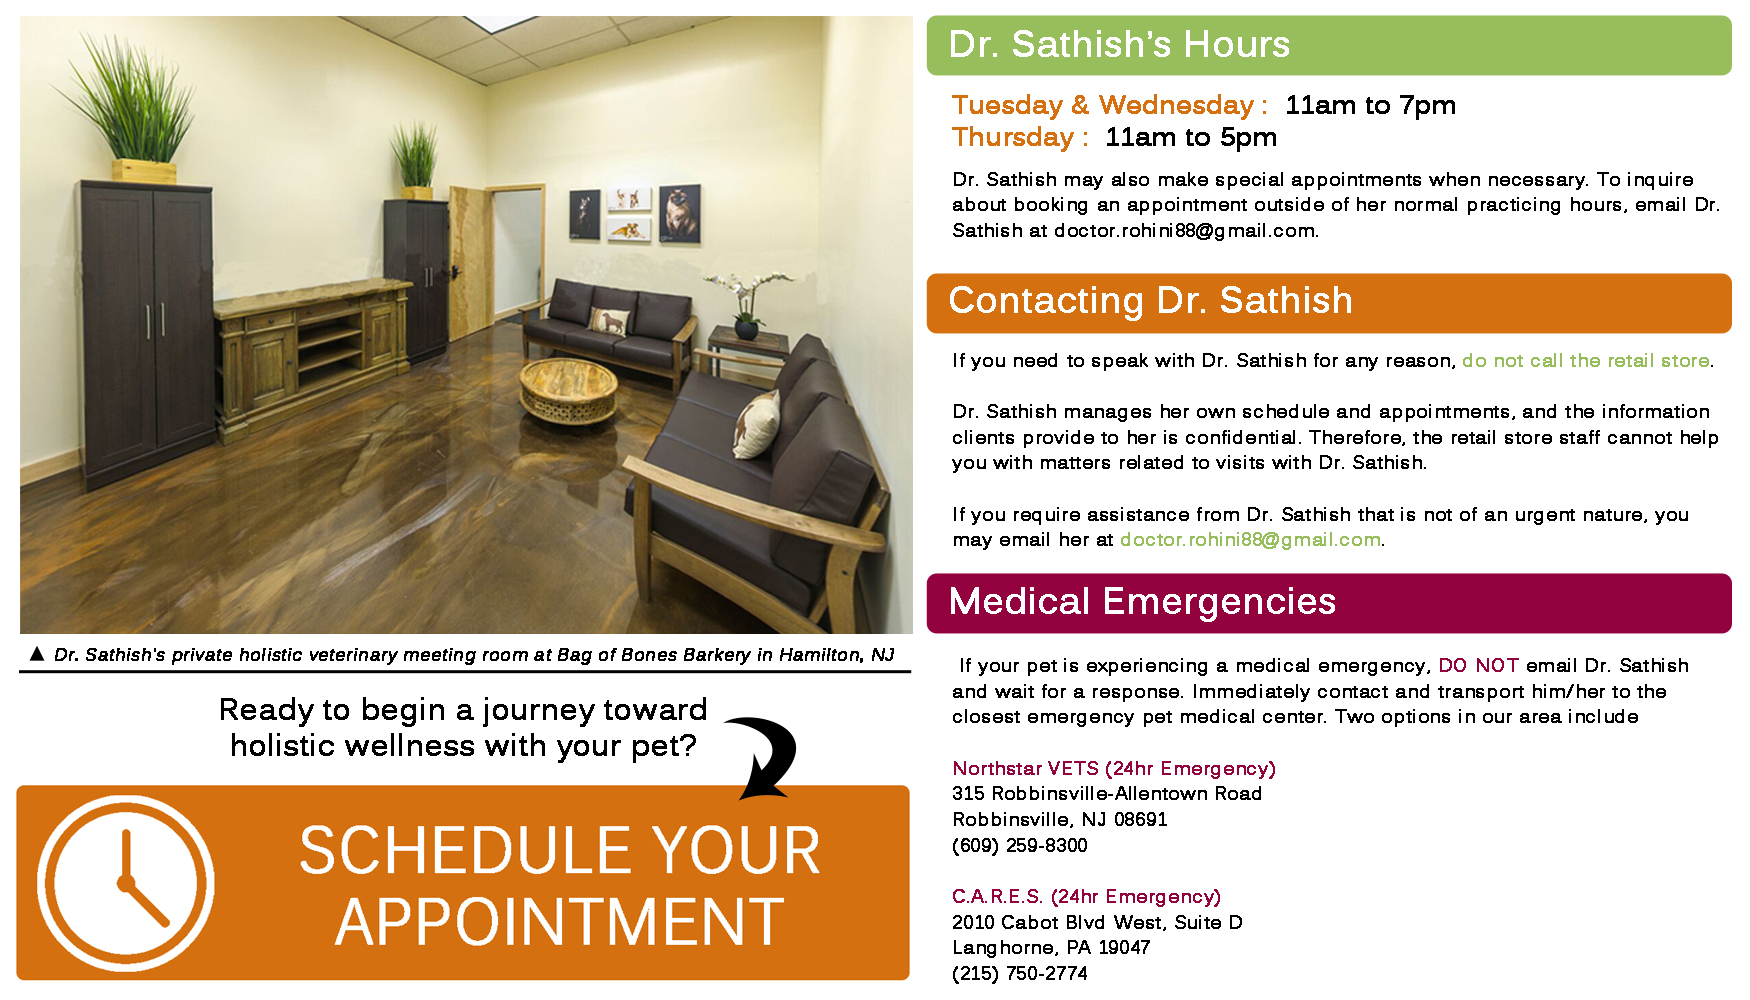 Dr. Sathishu0027s Hours U0026 Contact Info